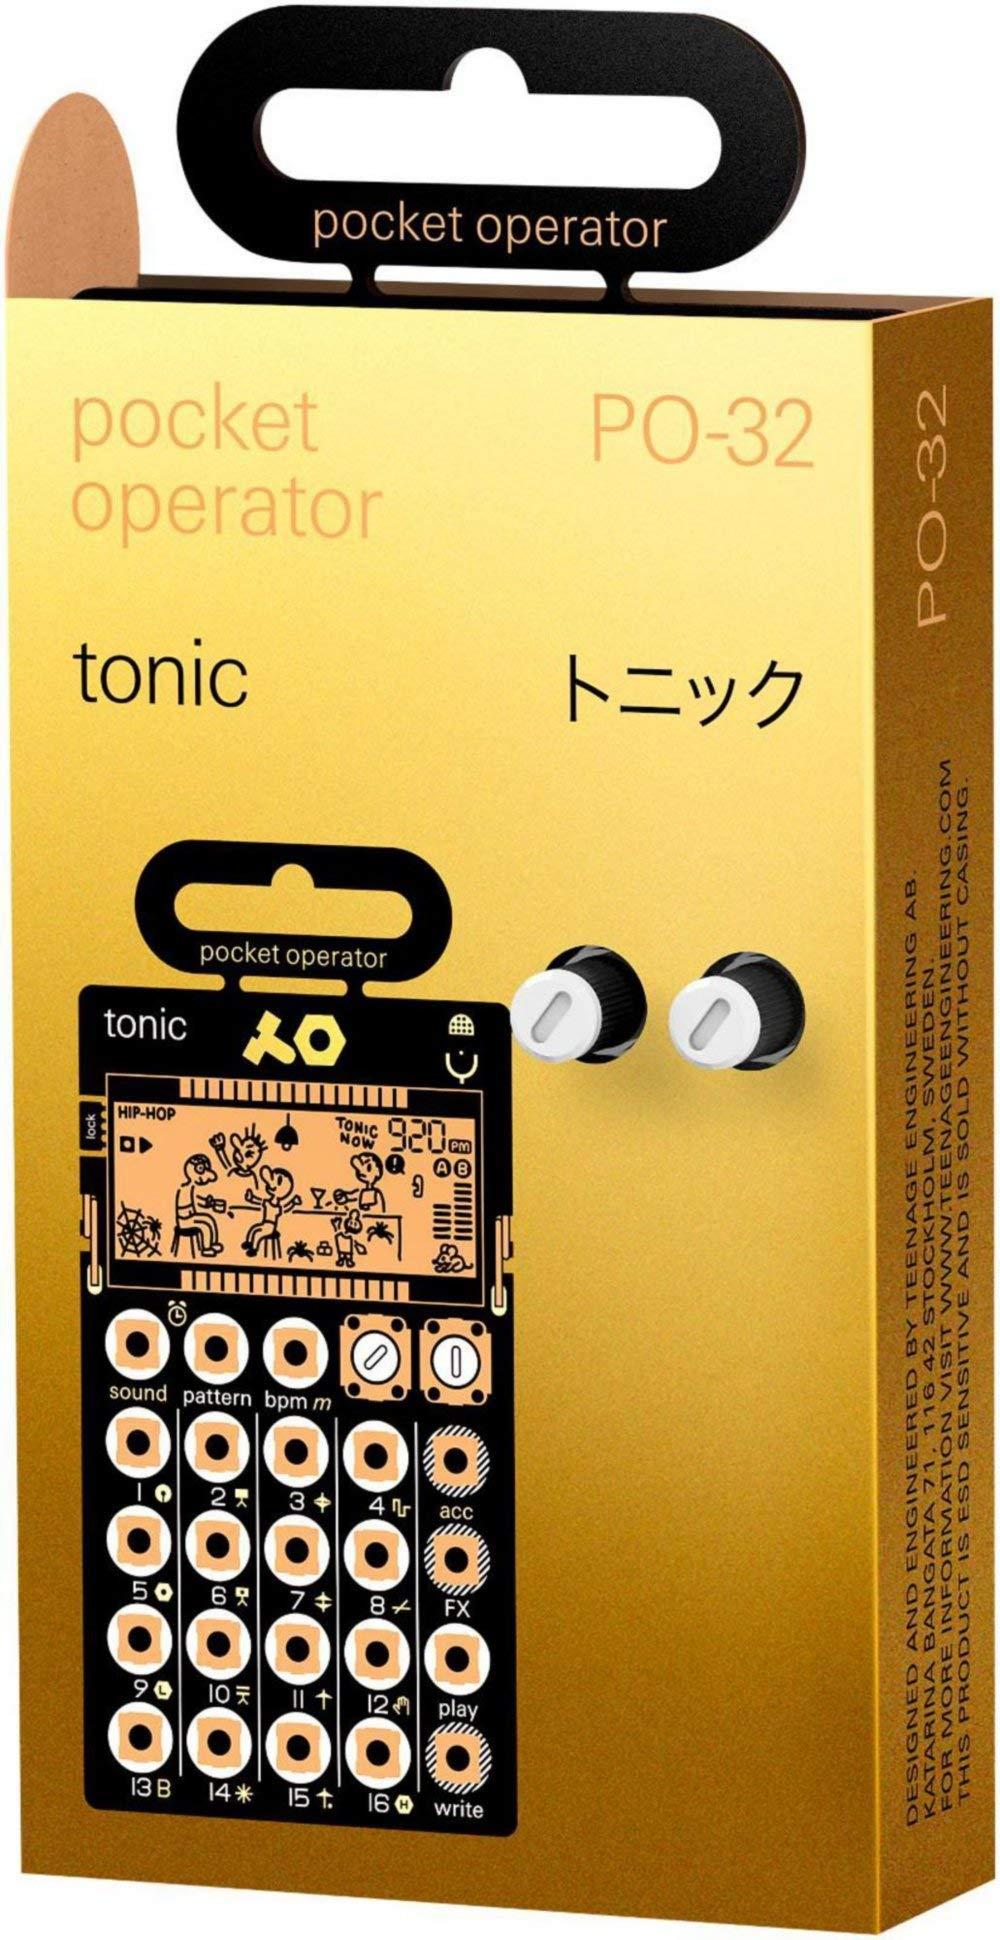 Teenage Engineering Pocket Operator PO-32 tonic Black (Certified Refurbished) by Teenage Engineering (Image #3)